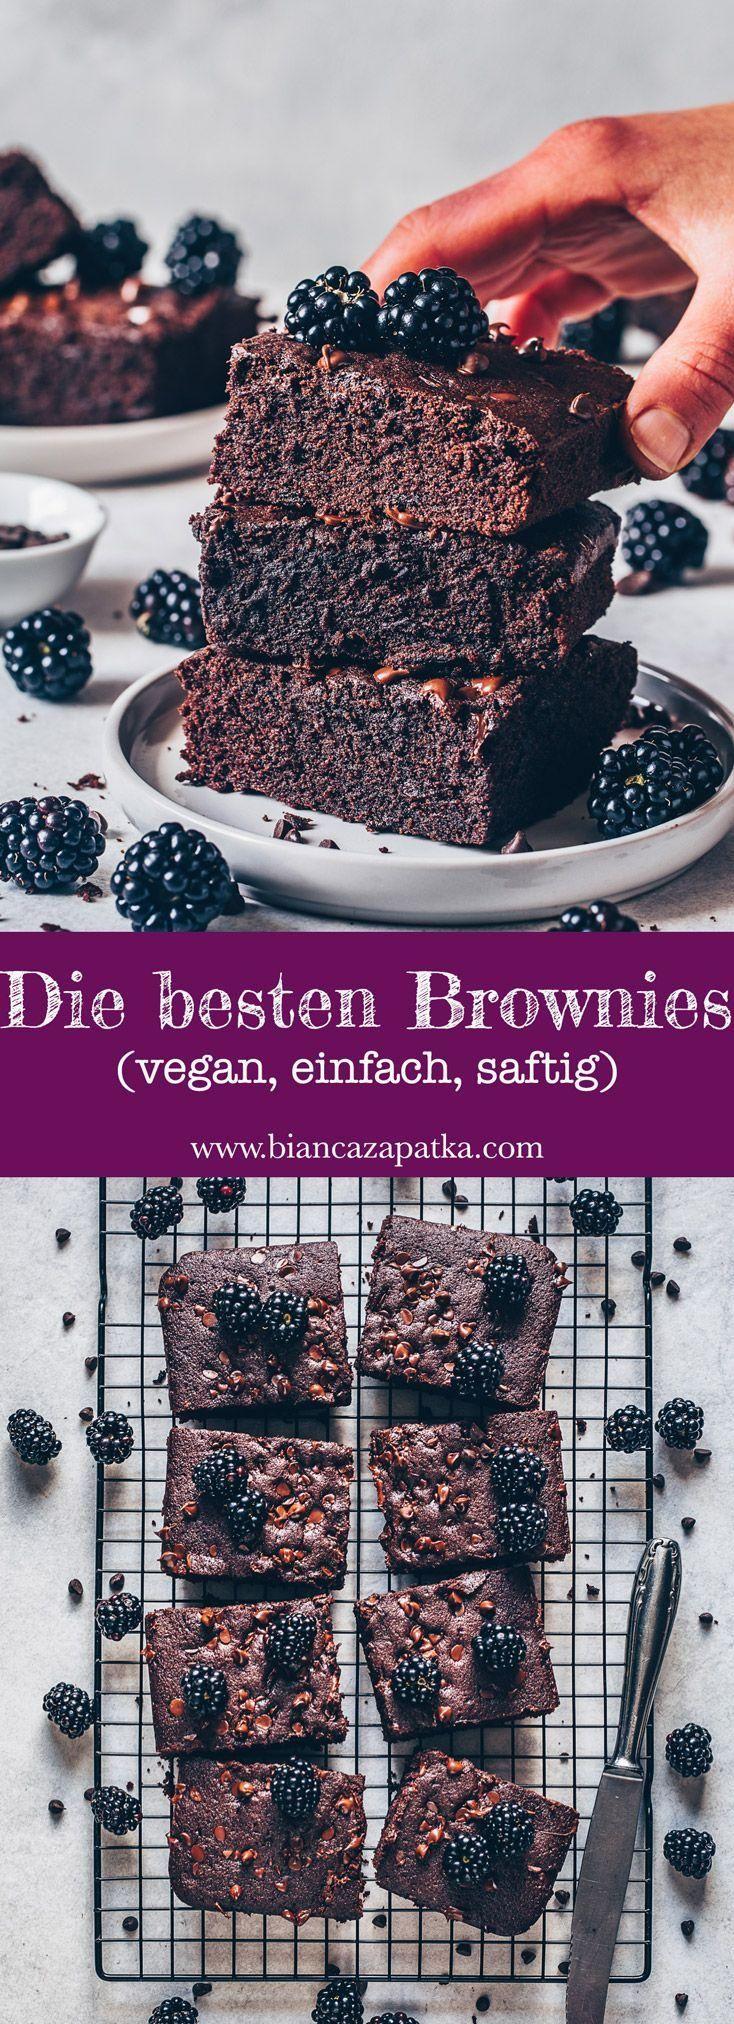 The Best Brownies - Vegan, Simple, Juicy - Bianca Zapatka | recipes  - Meine Rezepte - Bianca Zapat